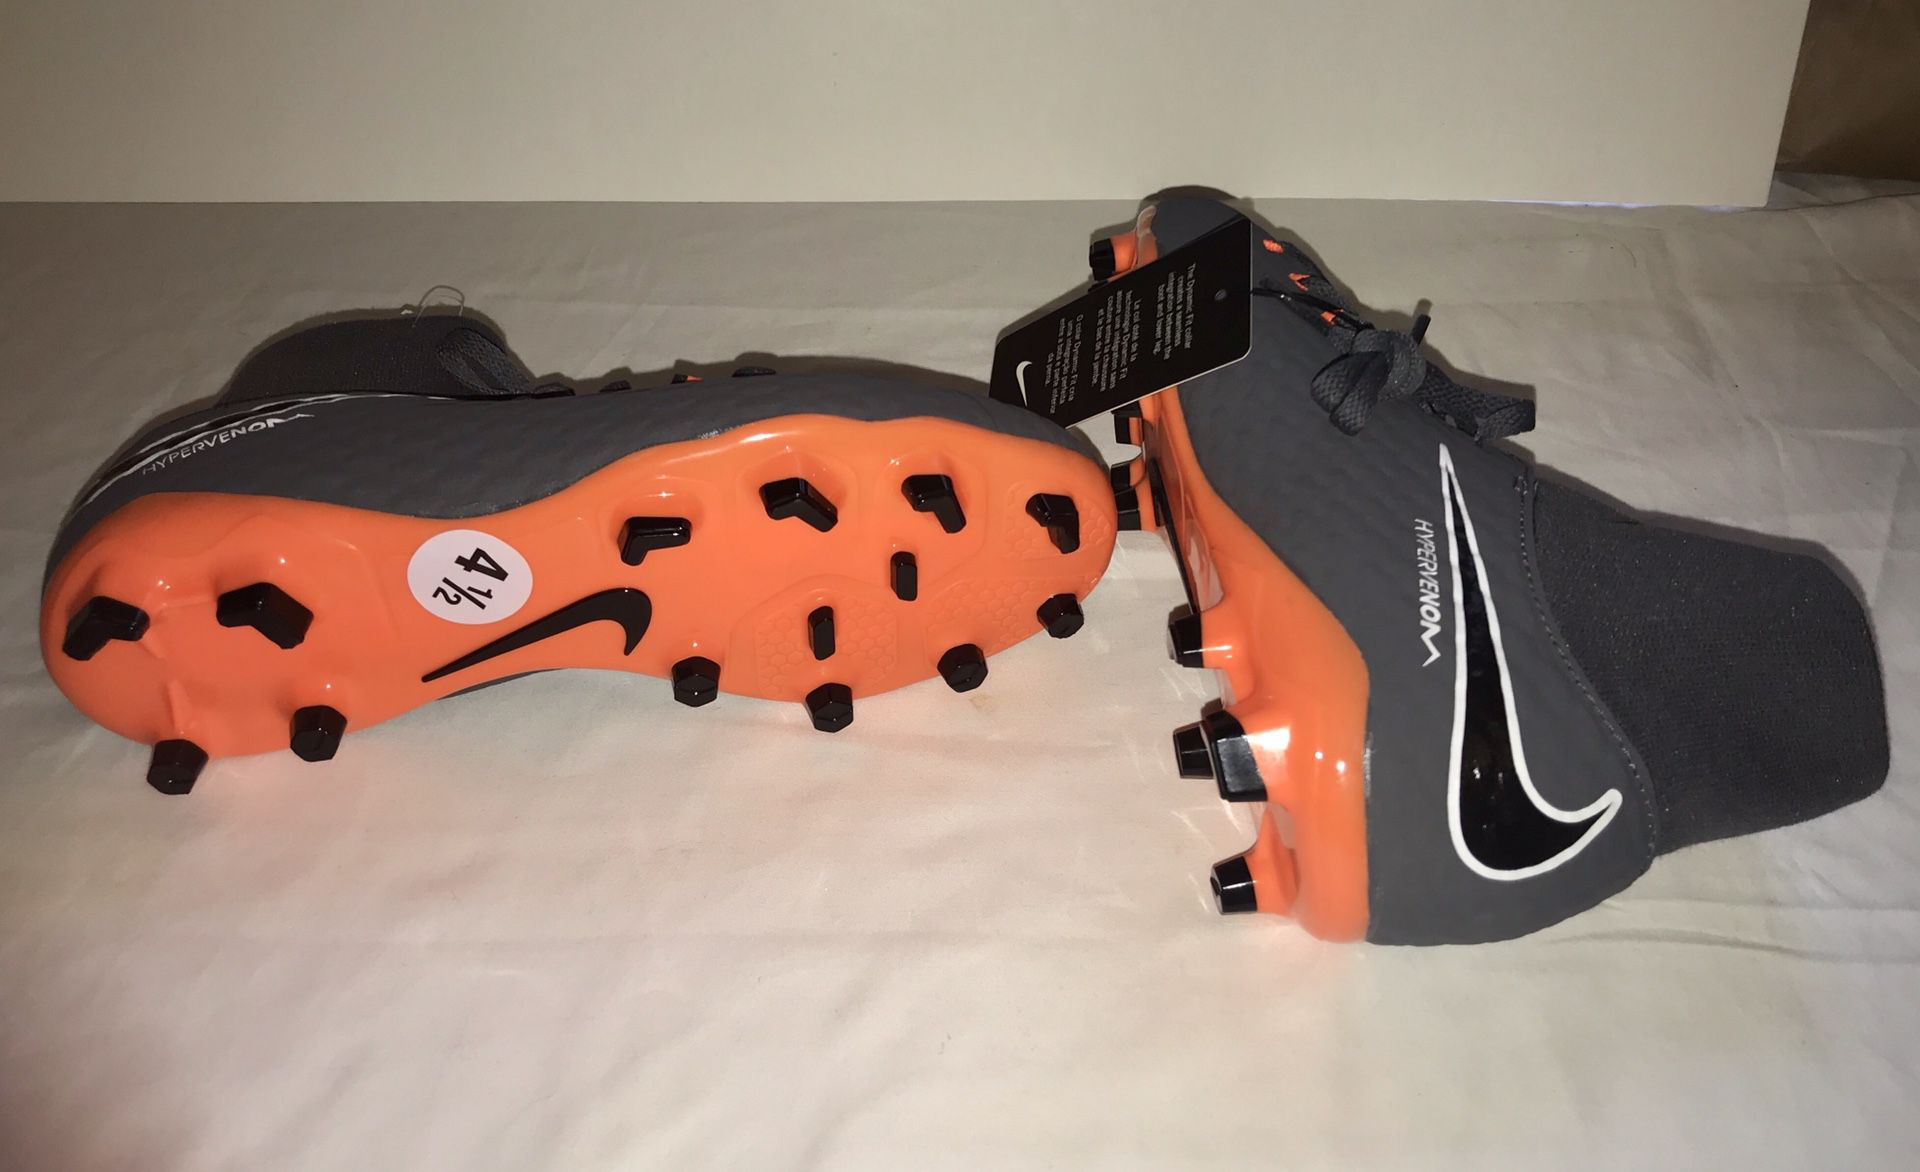 Hypervenom Nike Cleats Brand New size 4 kids